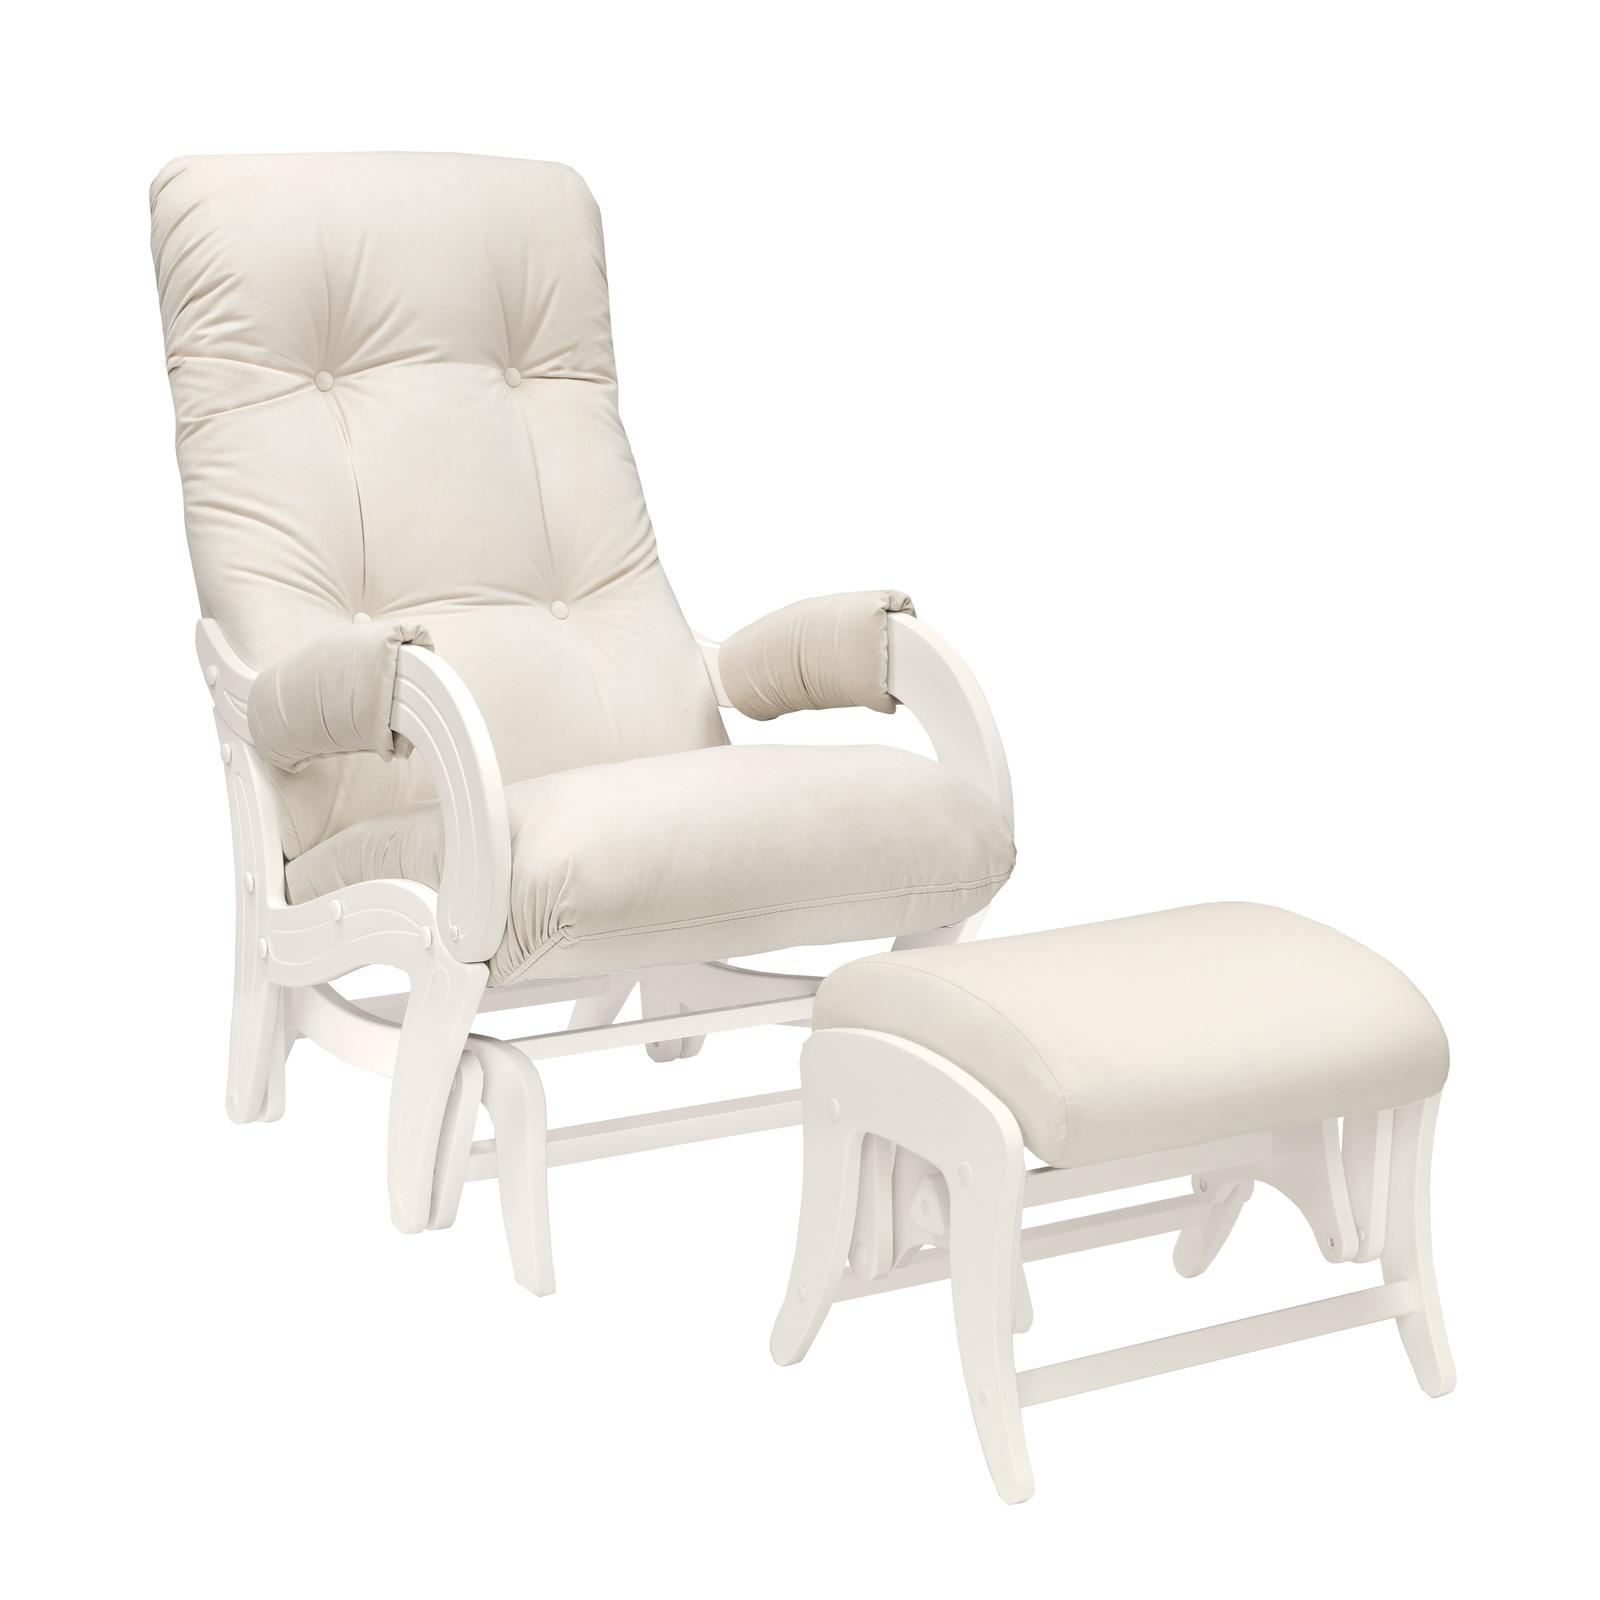 Кресло-качалка  Milli Care